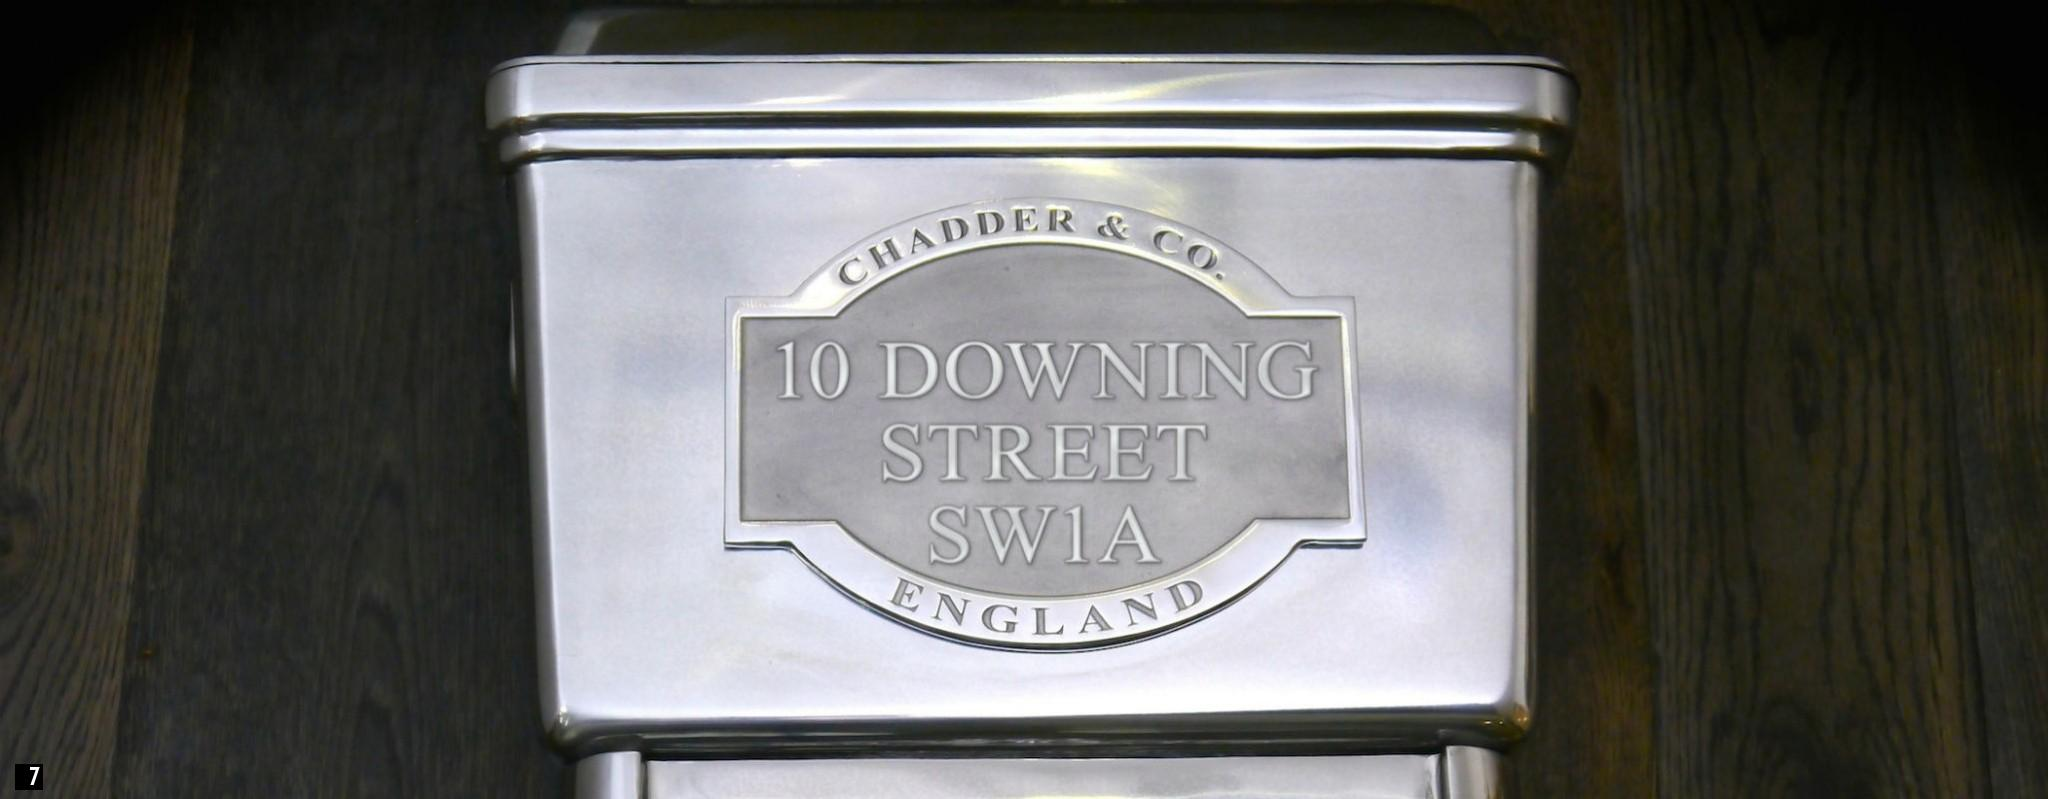 Bespoke Toilet Cistern 10 DOWNING STREET